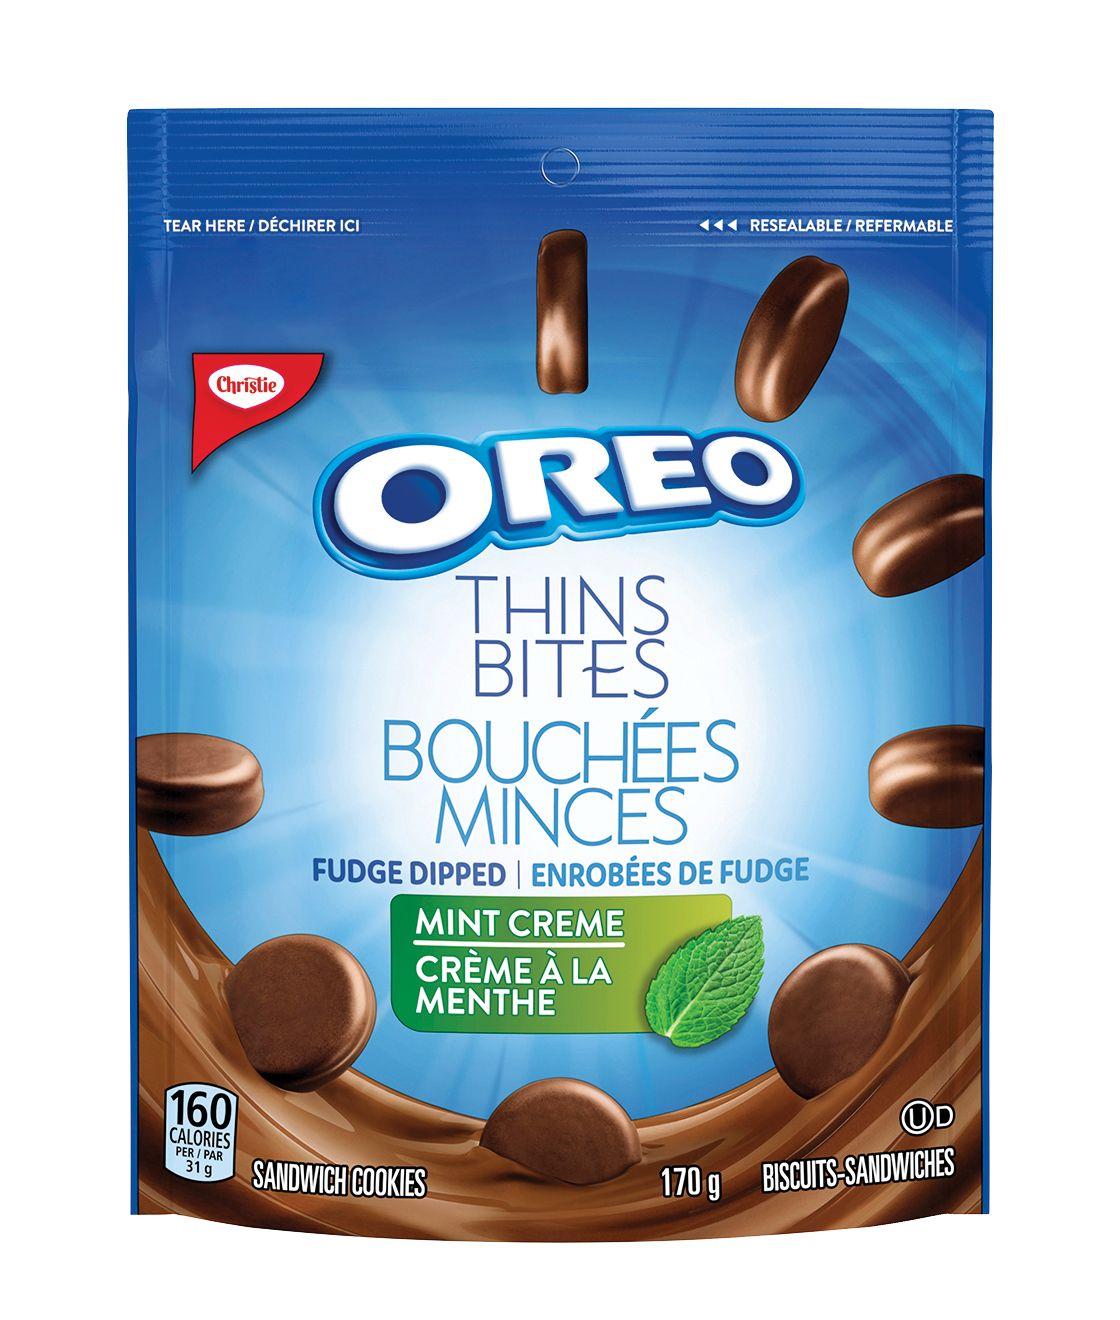 OREO Thin Bites DIPPED MINT CREME 170 GRM